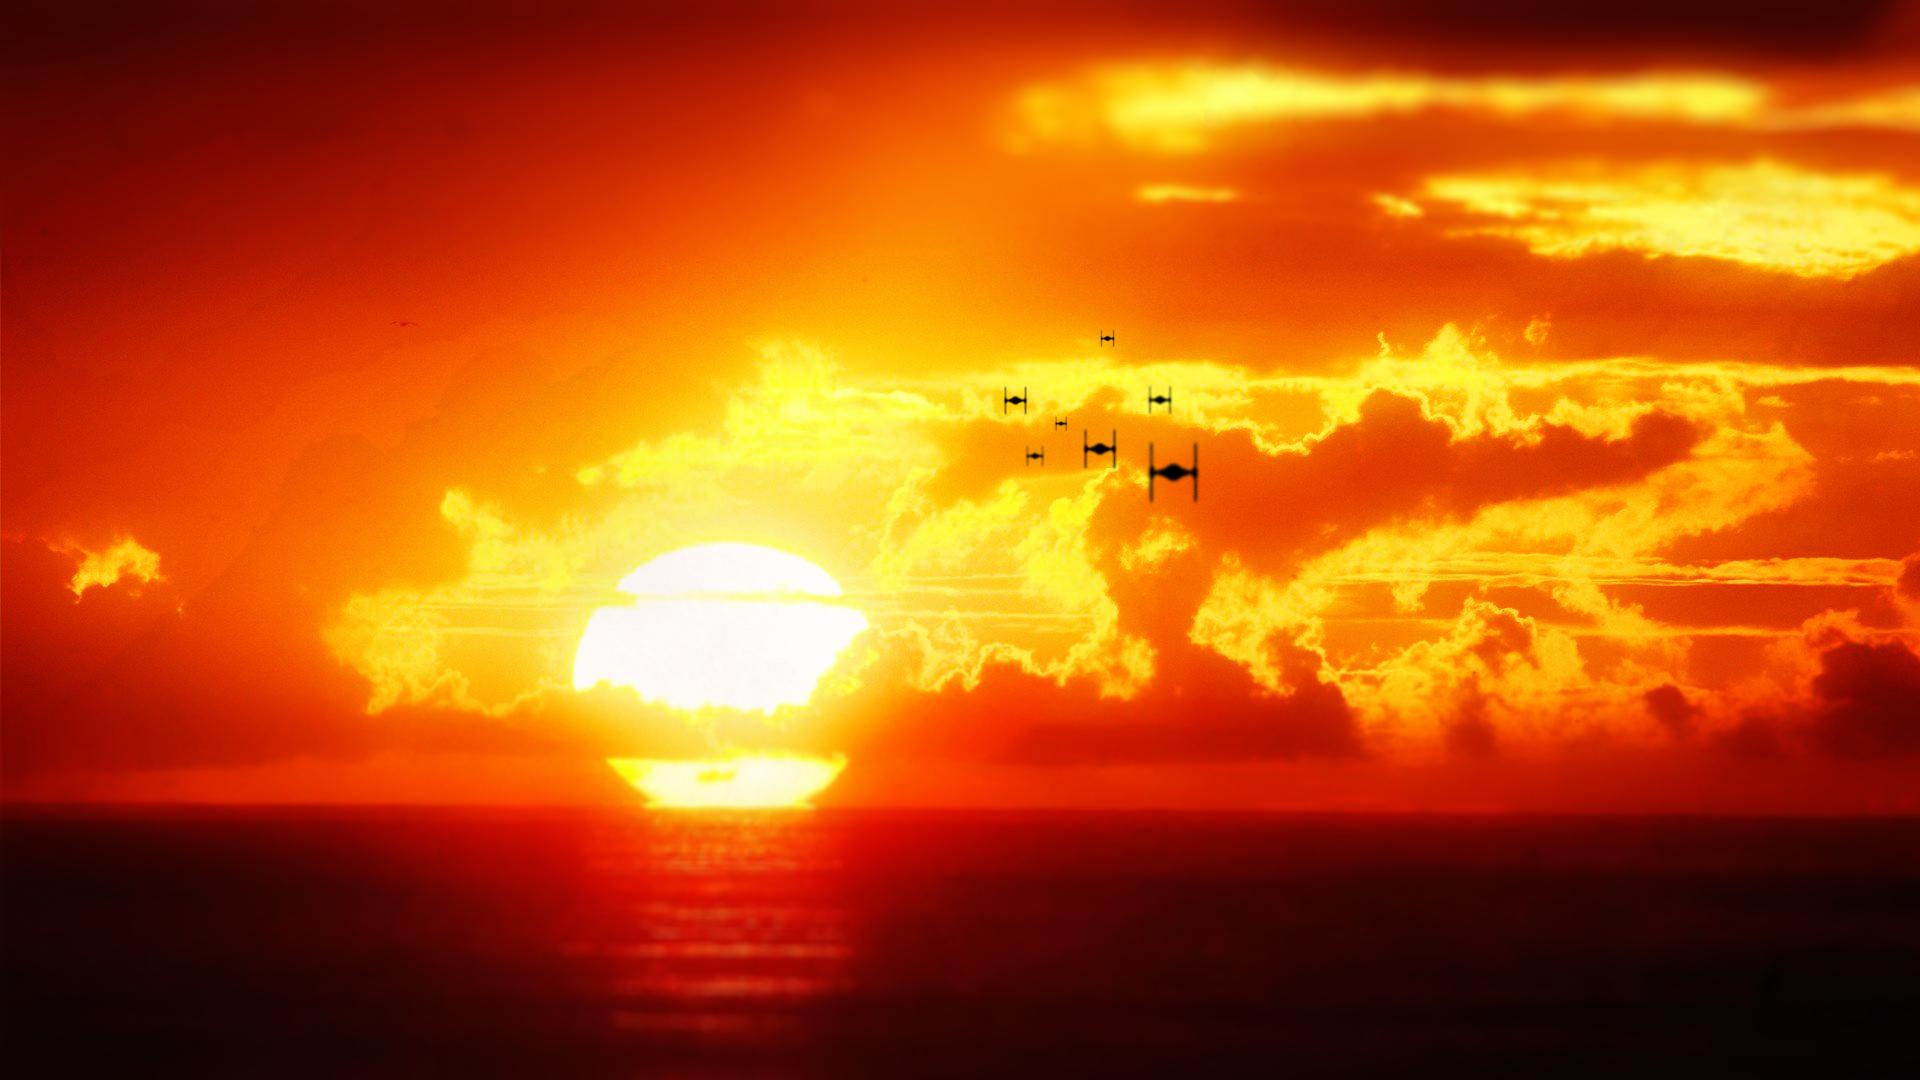 star wars tie fighter sunset wallpapernihilusdesigns on deviantart